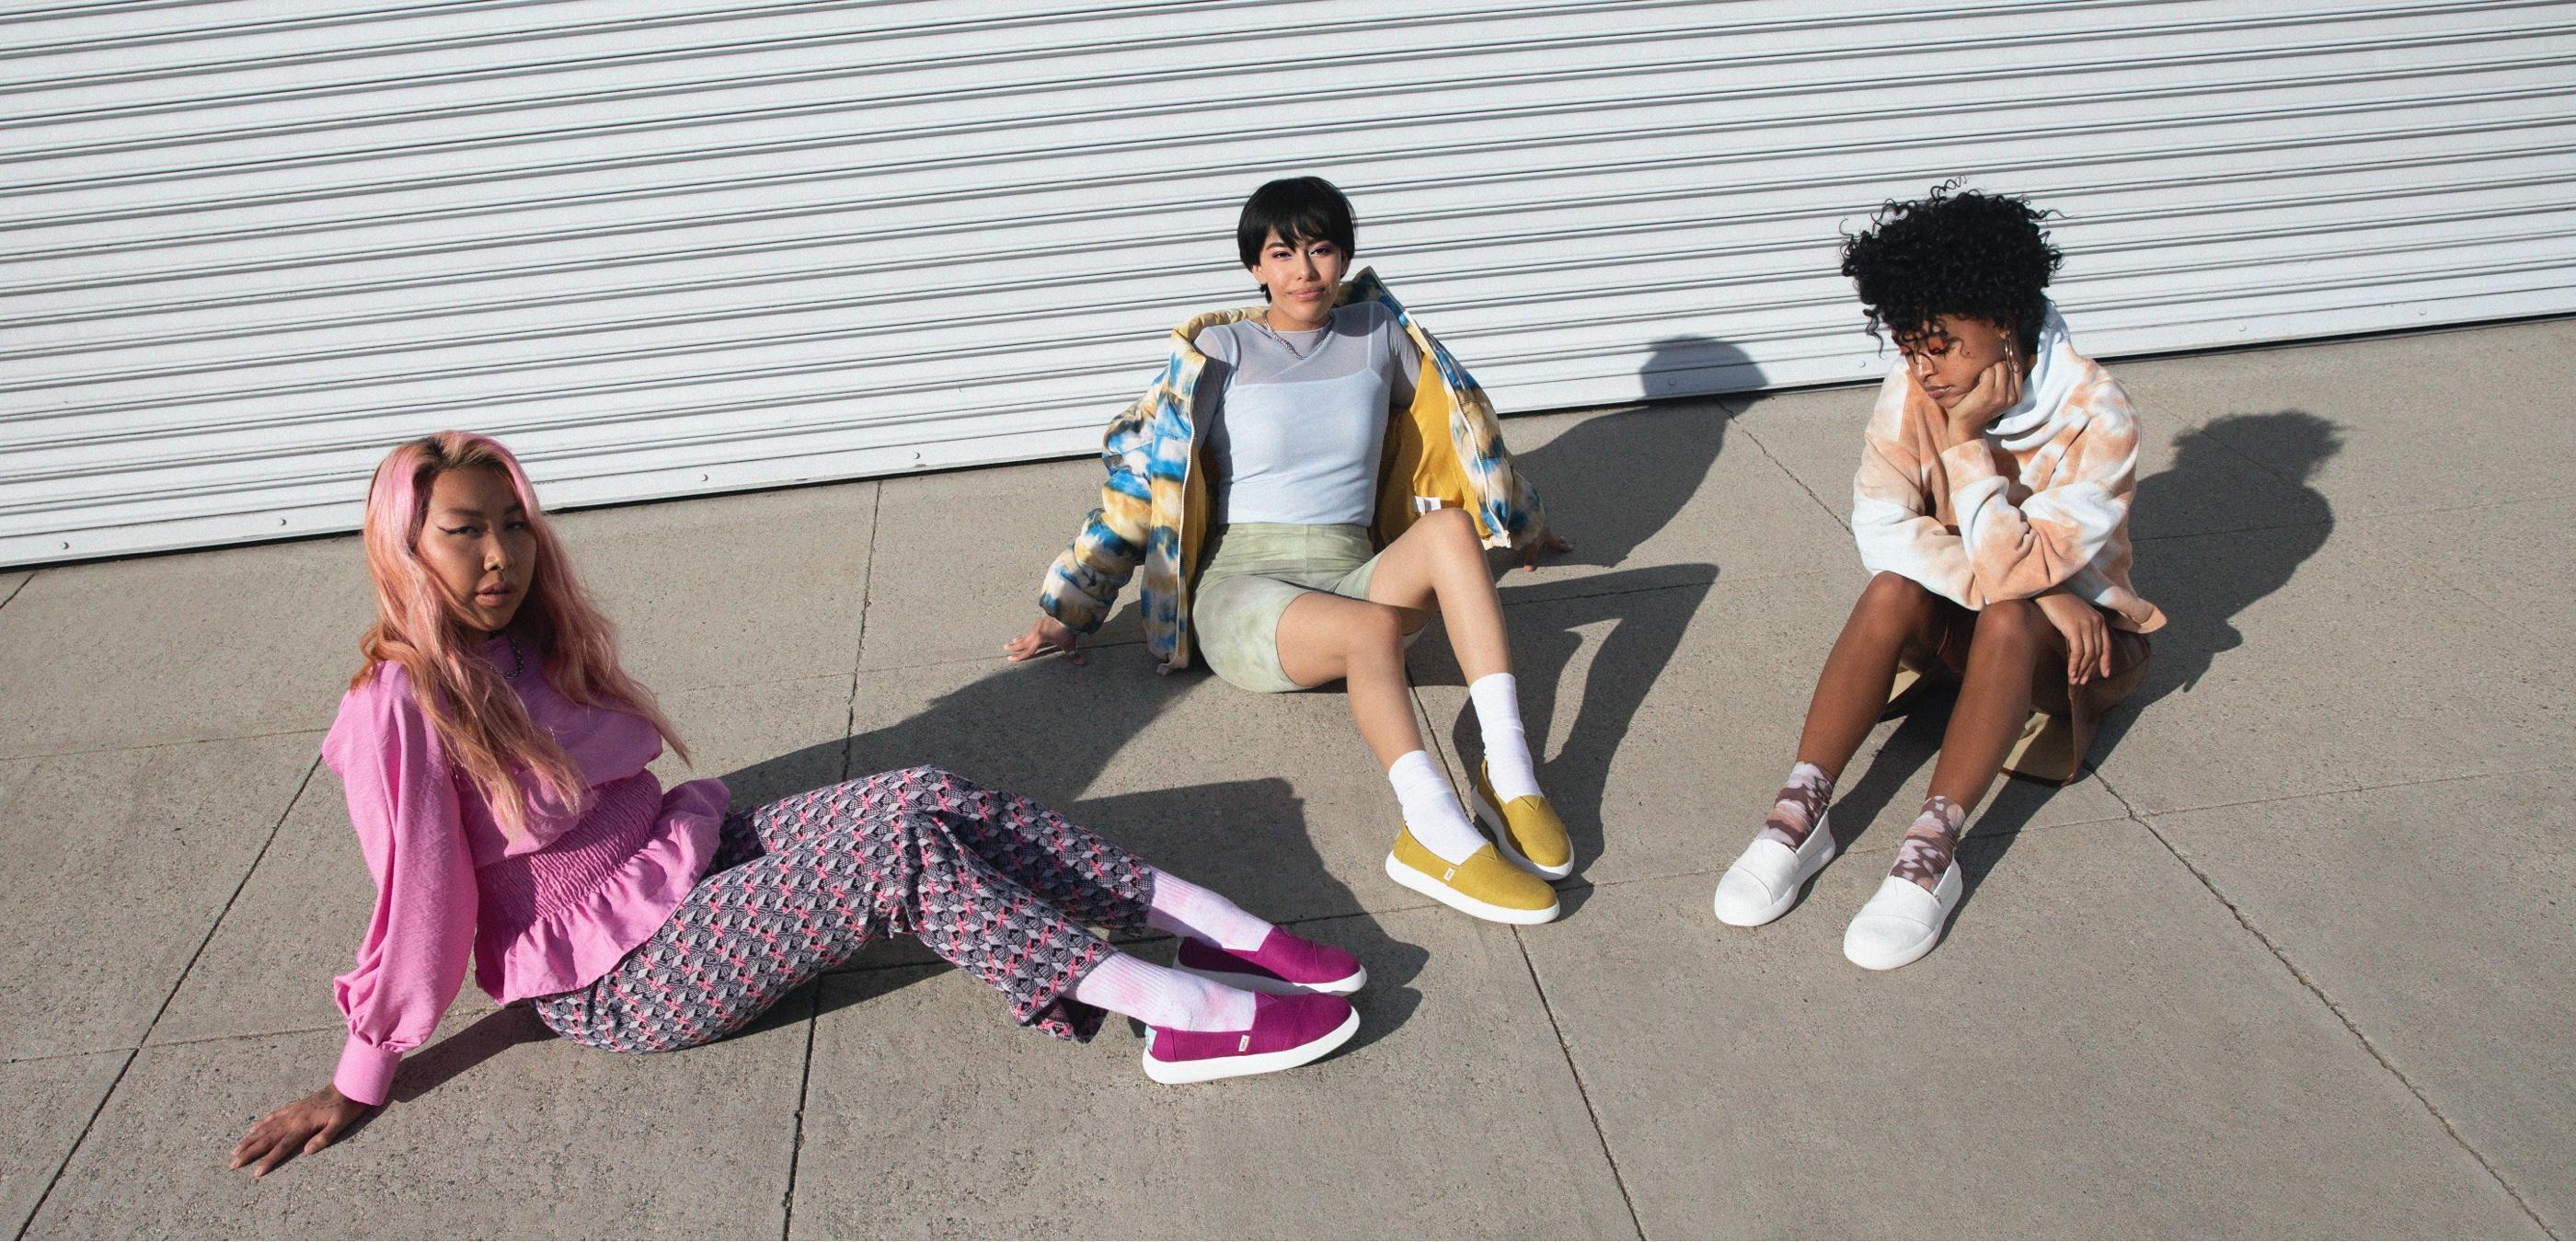 Models sitting together wearing Alpargata Mallow in fuchsia, dark mustard, and white styles.